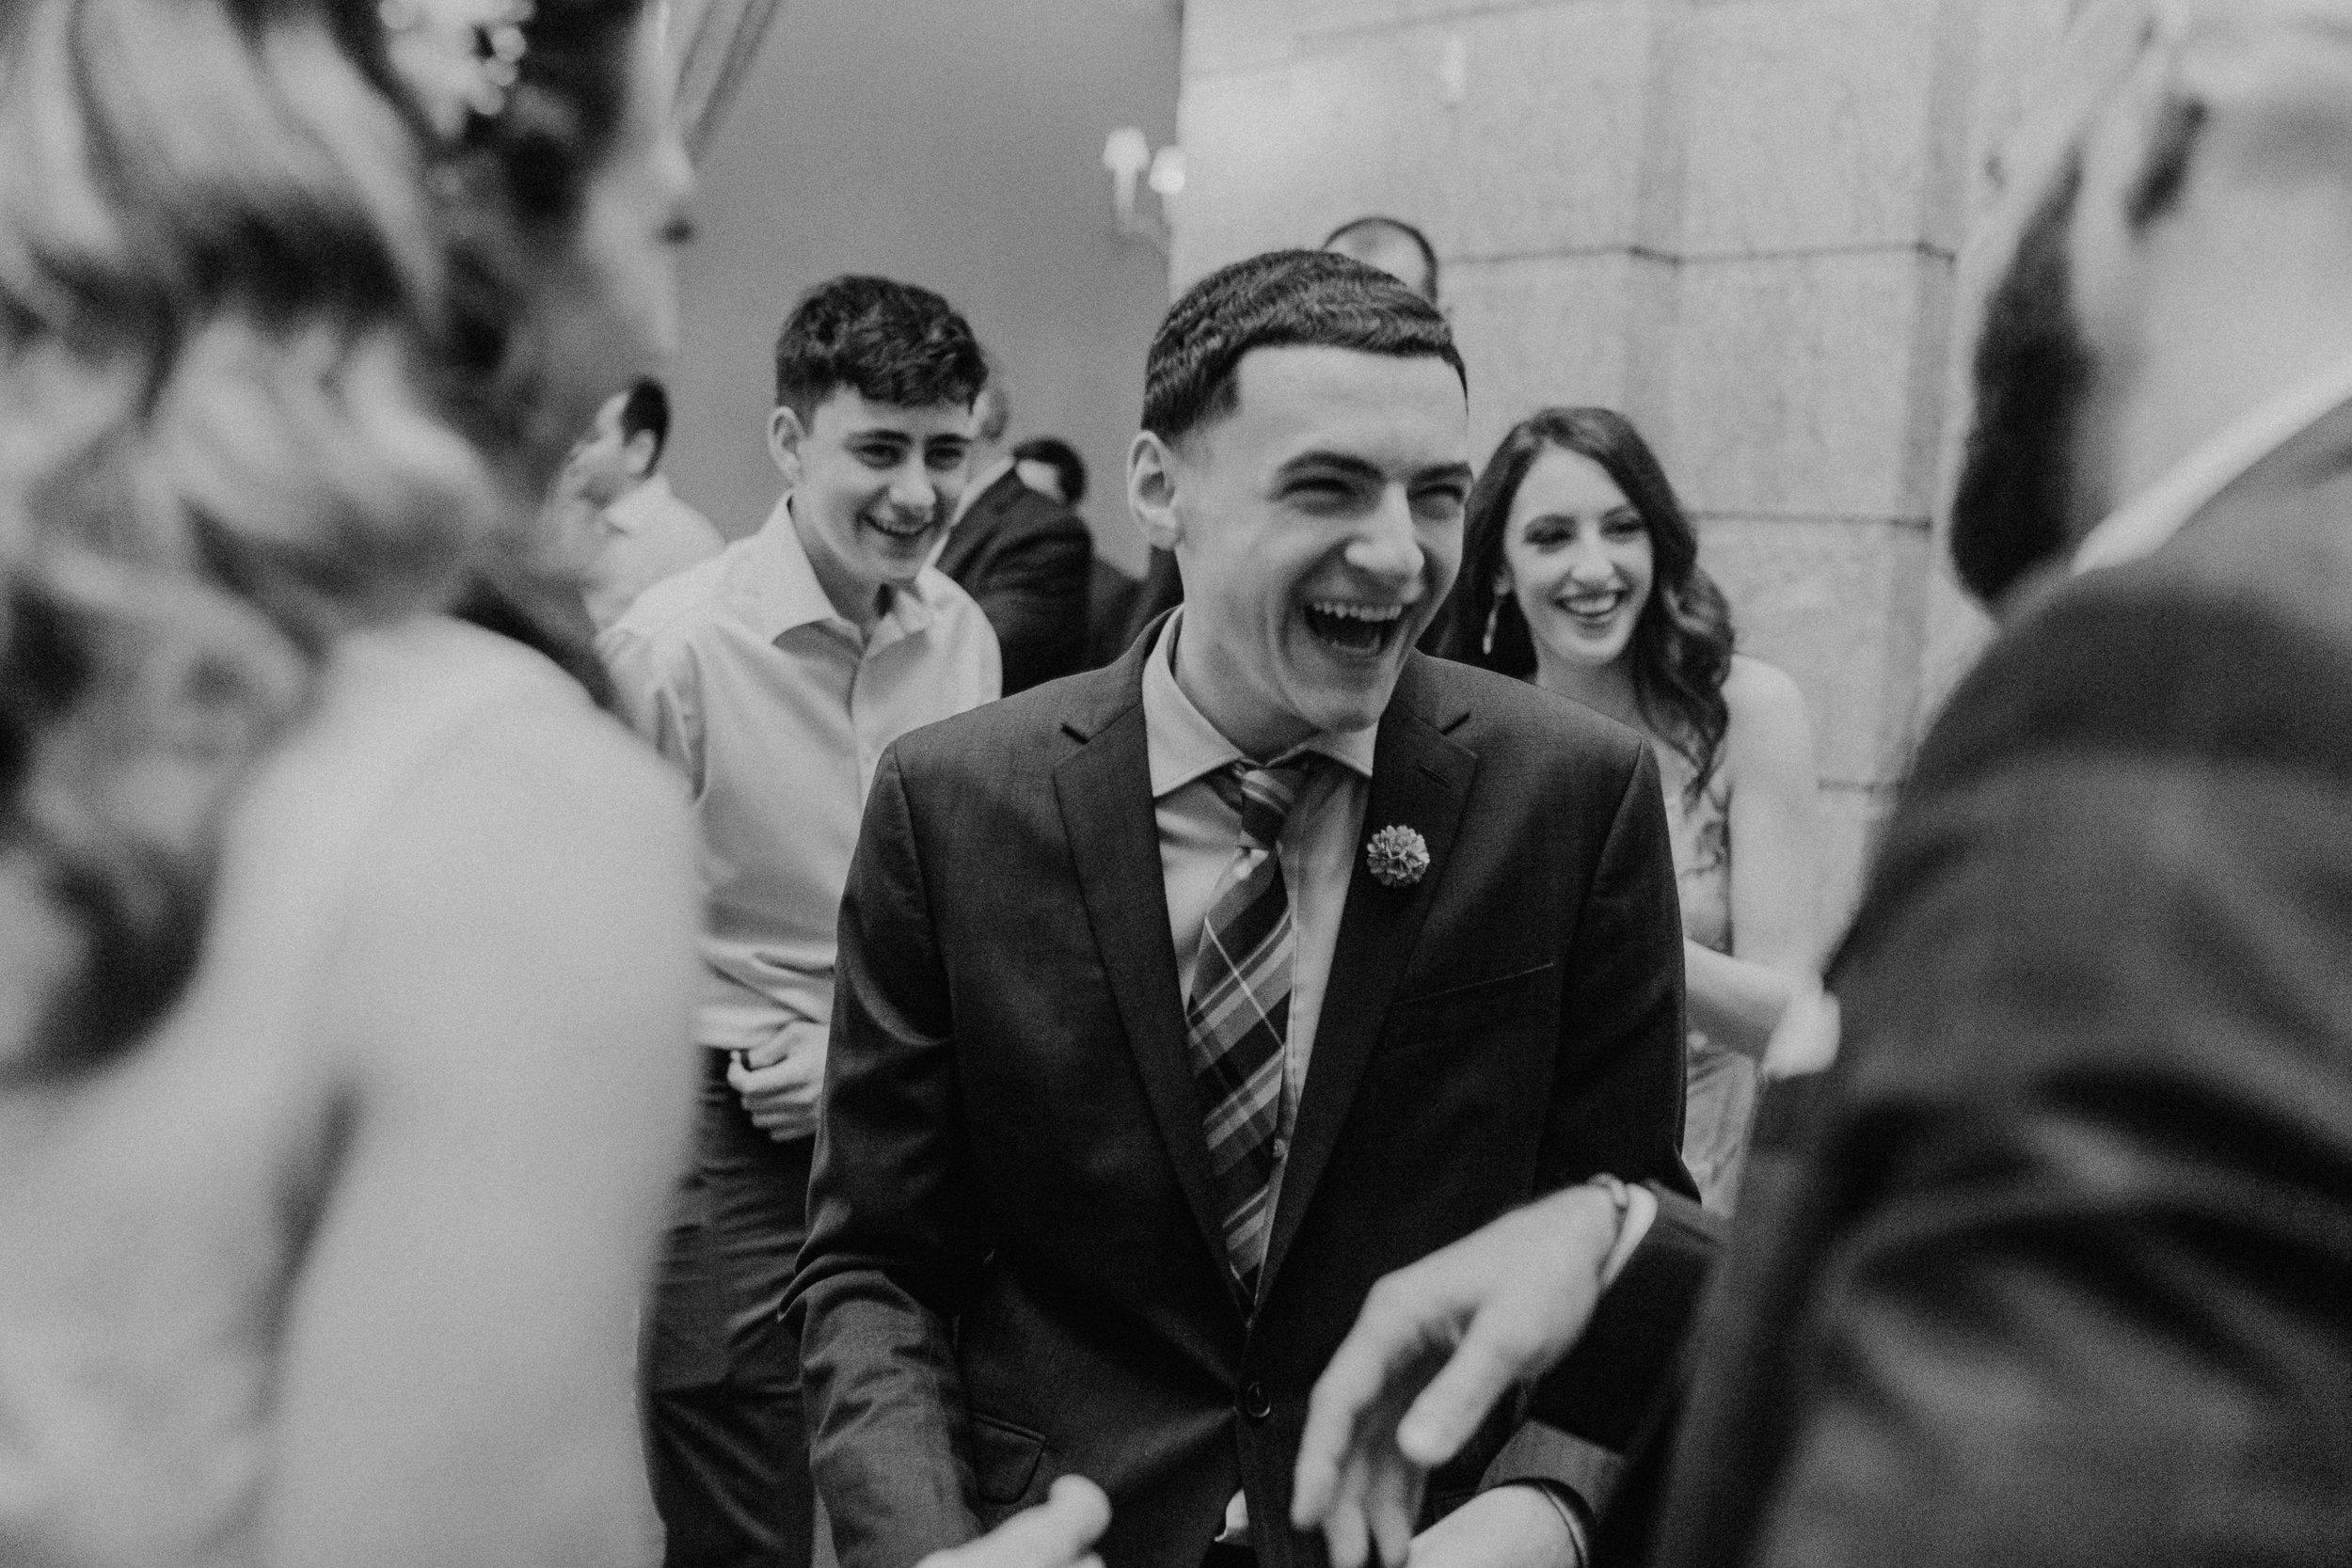 albany-new-york-wedding-67.jpg